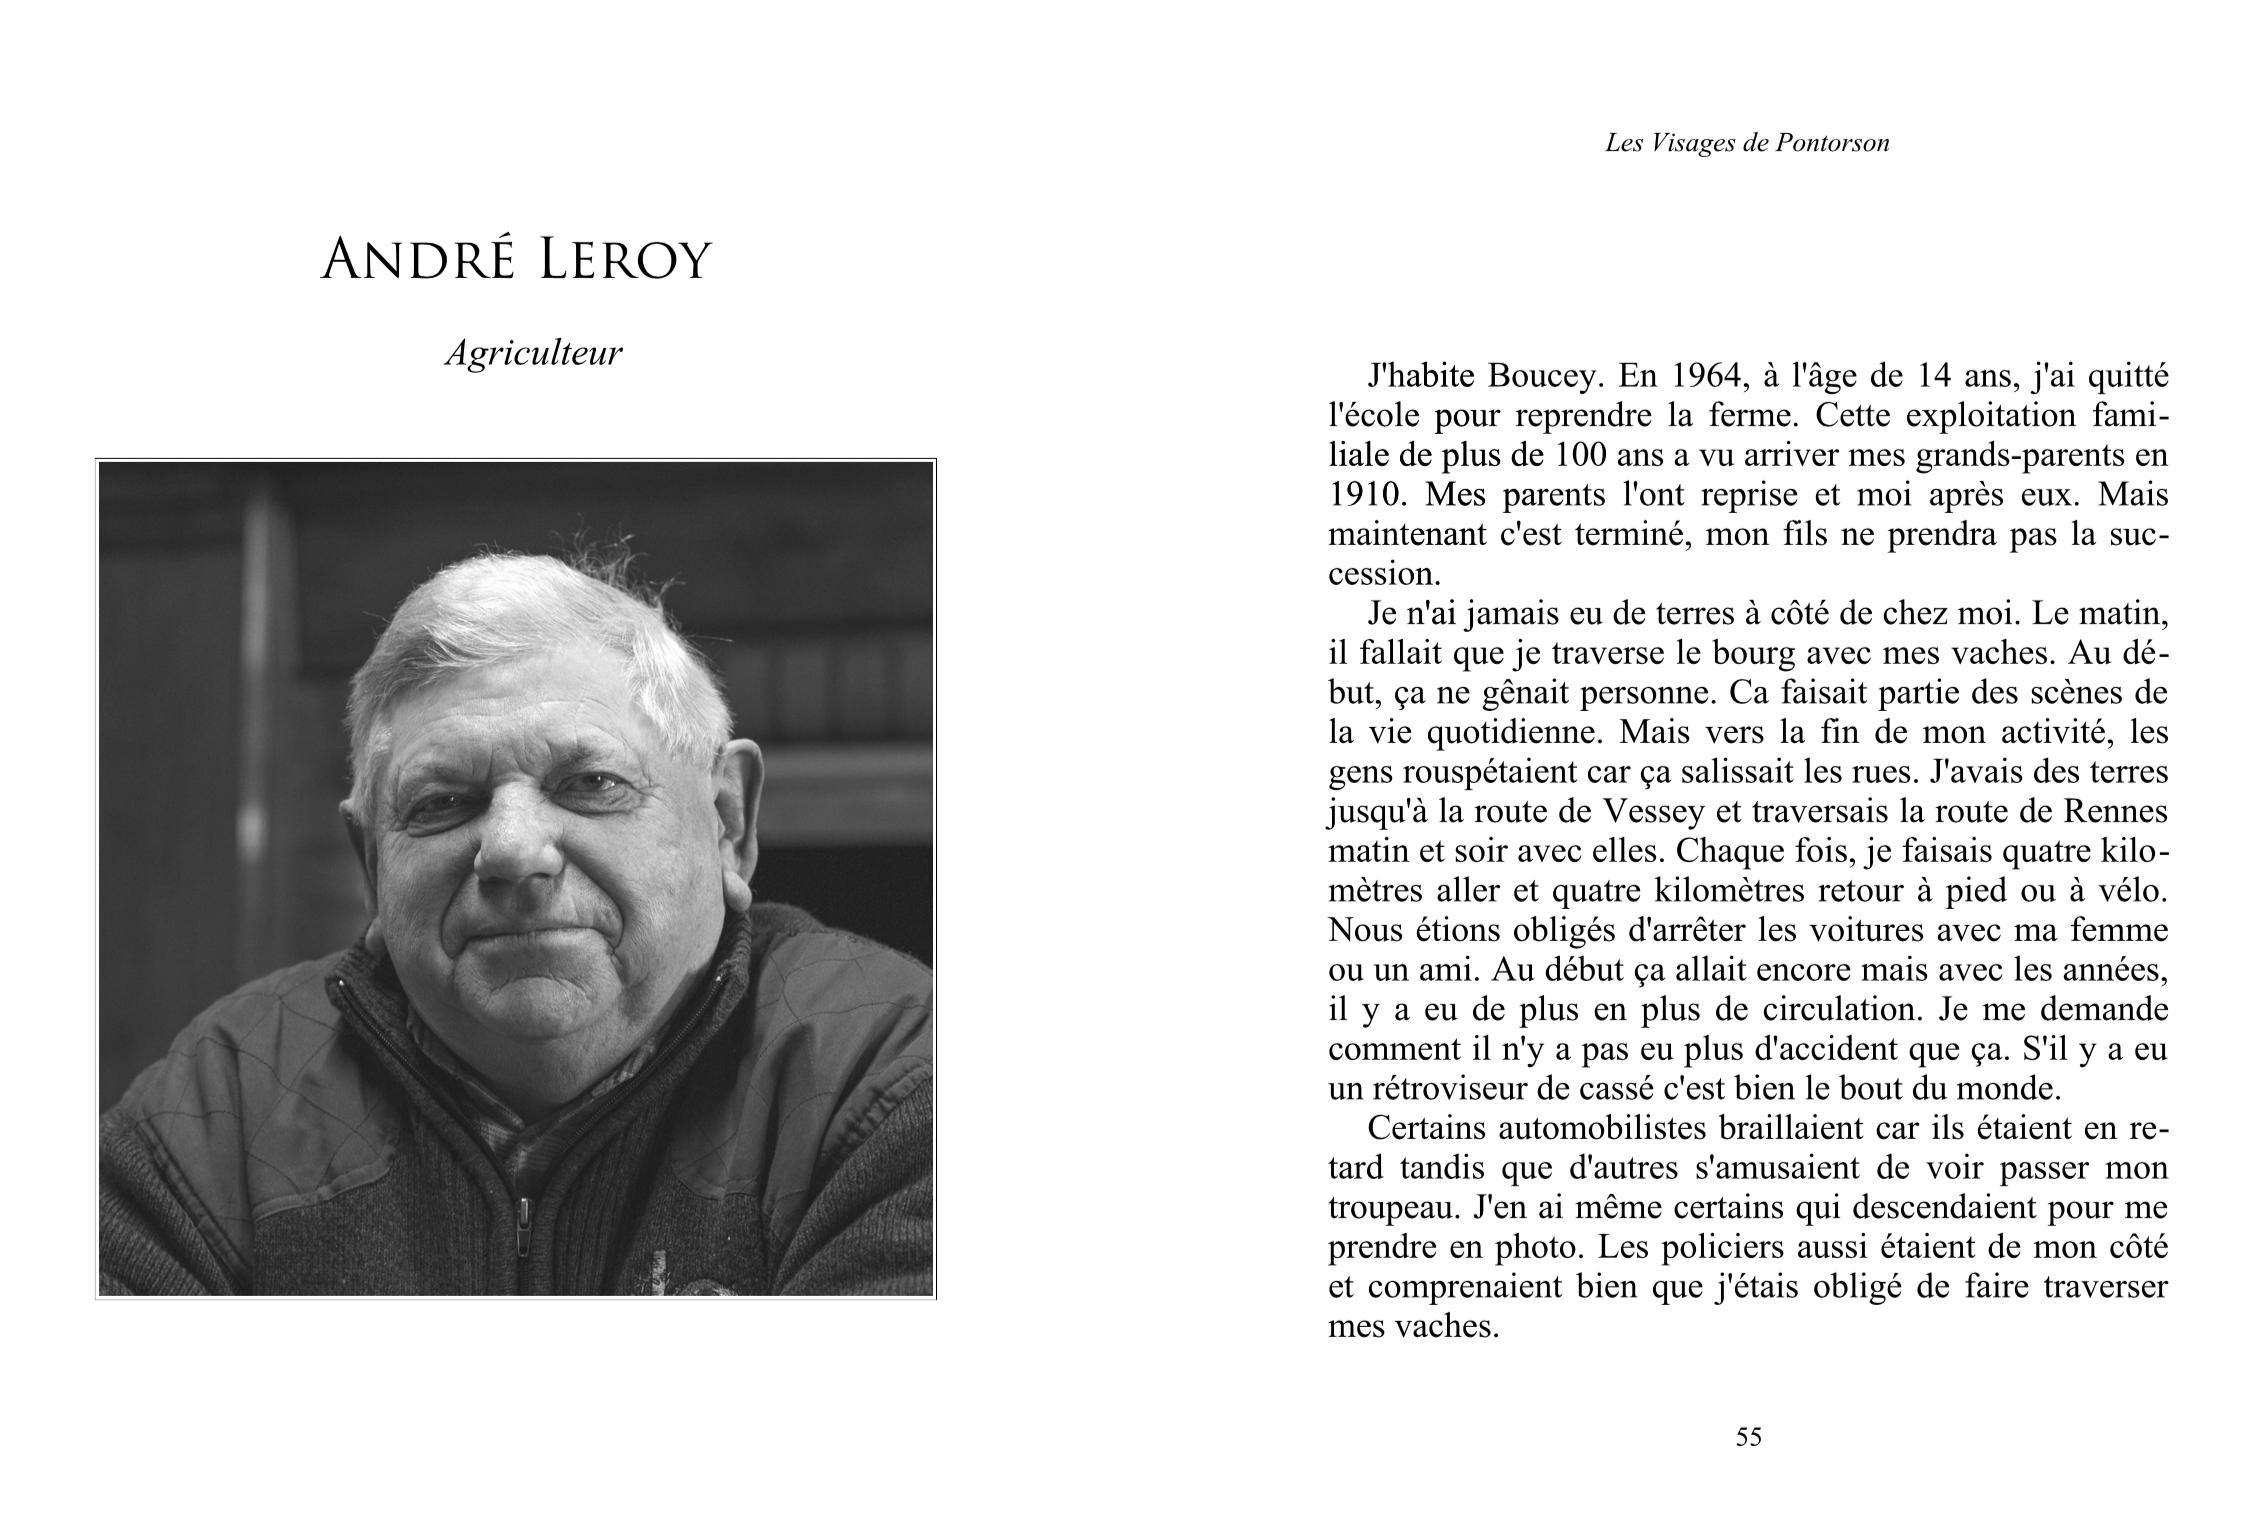 Mr leroy